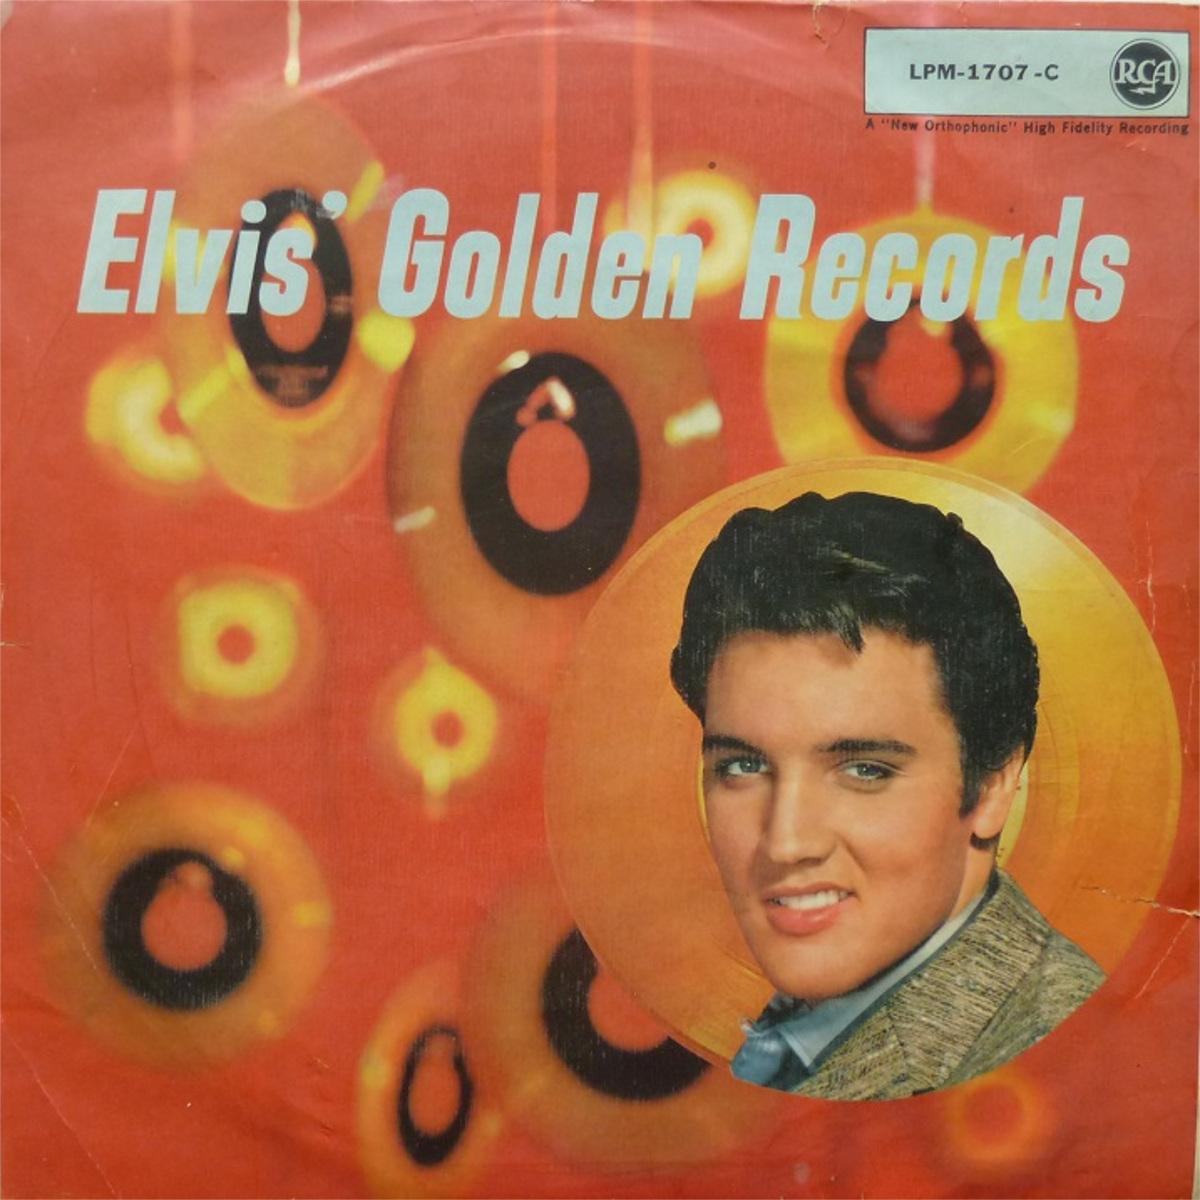 ELVIS' GOLDEN RECORDS 1268oz2x